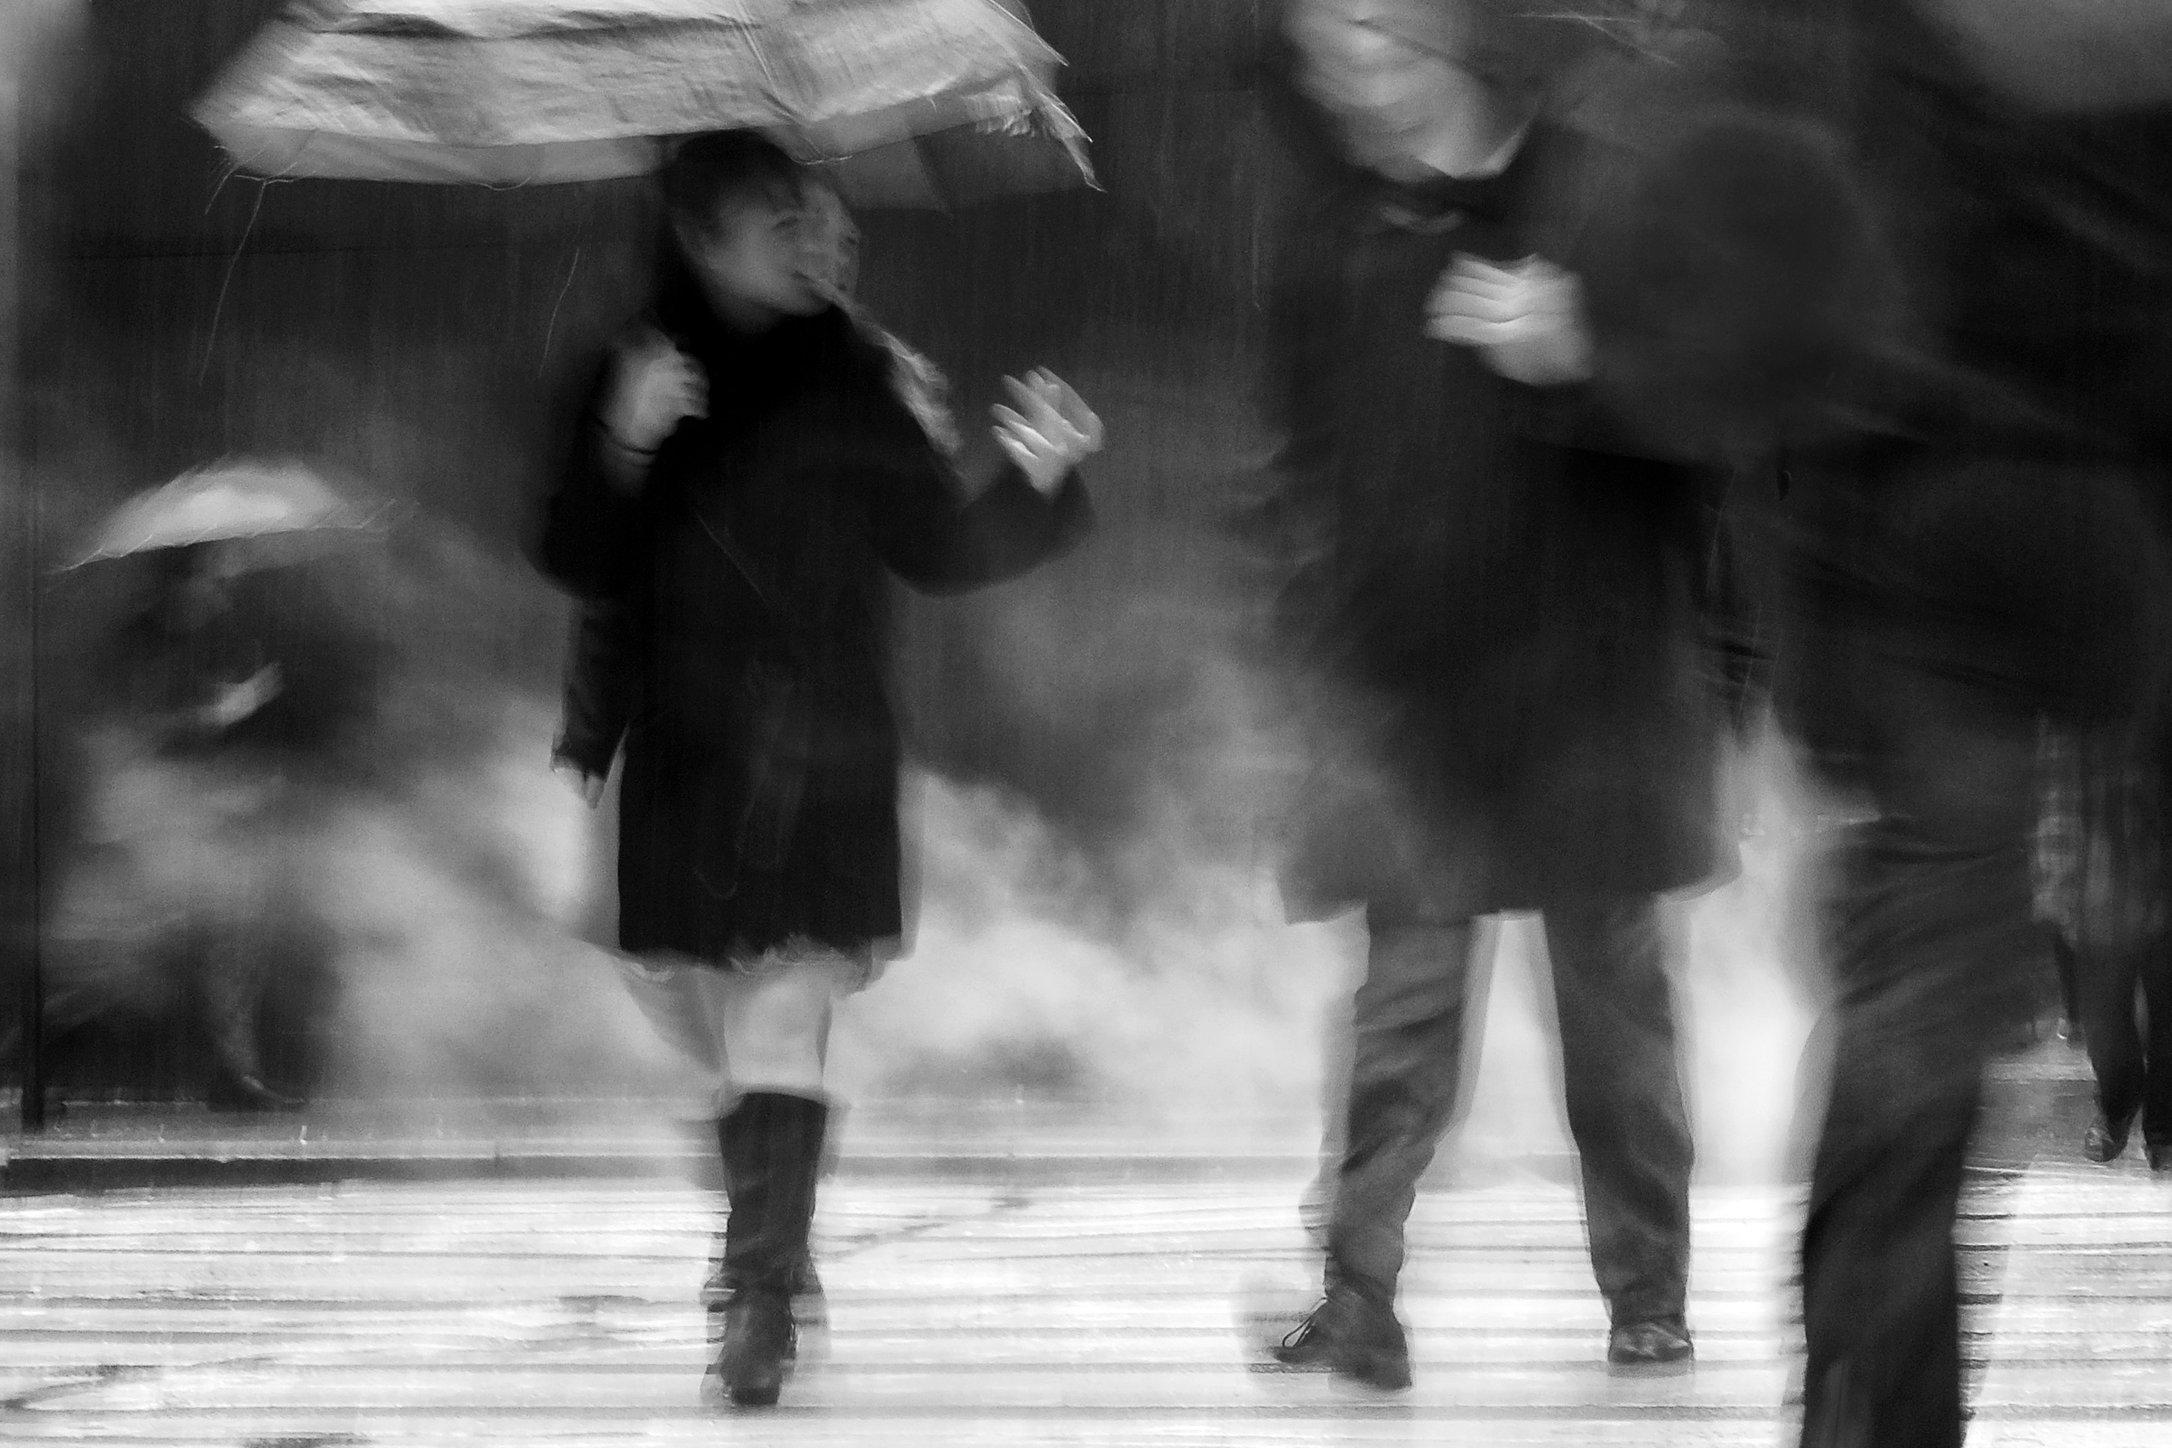 foggy-umbrellas.jpg